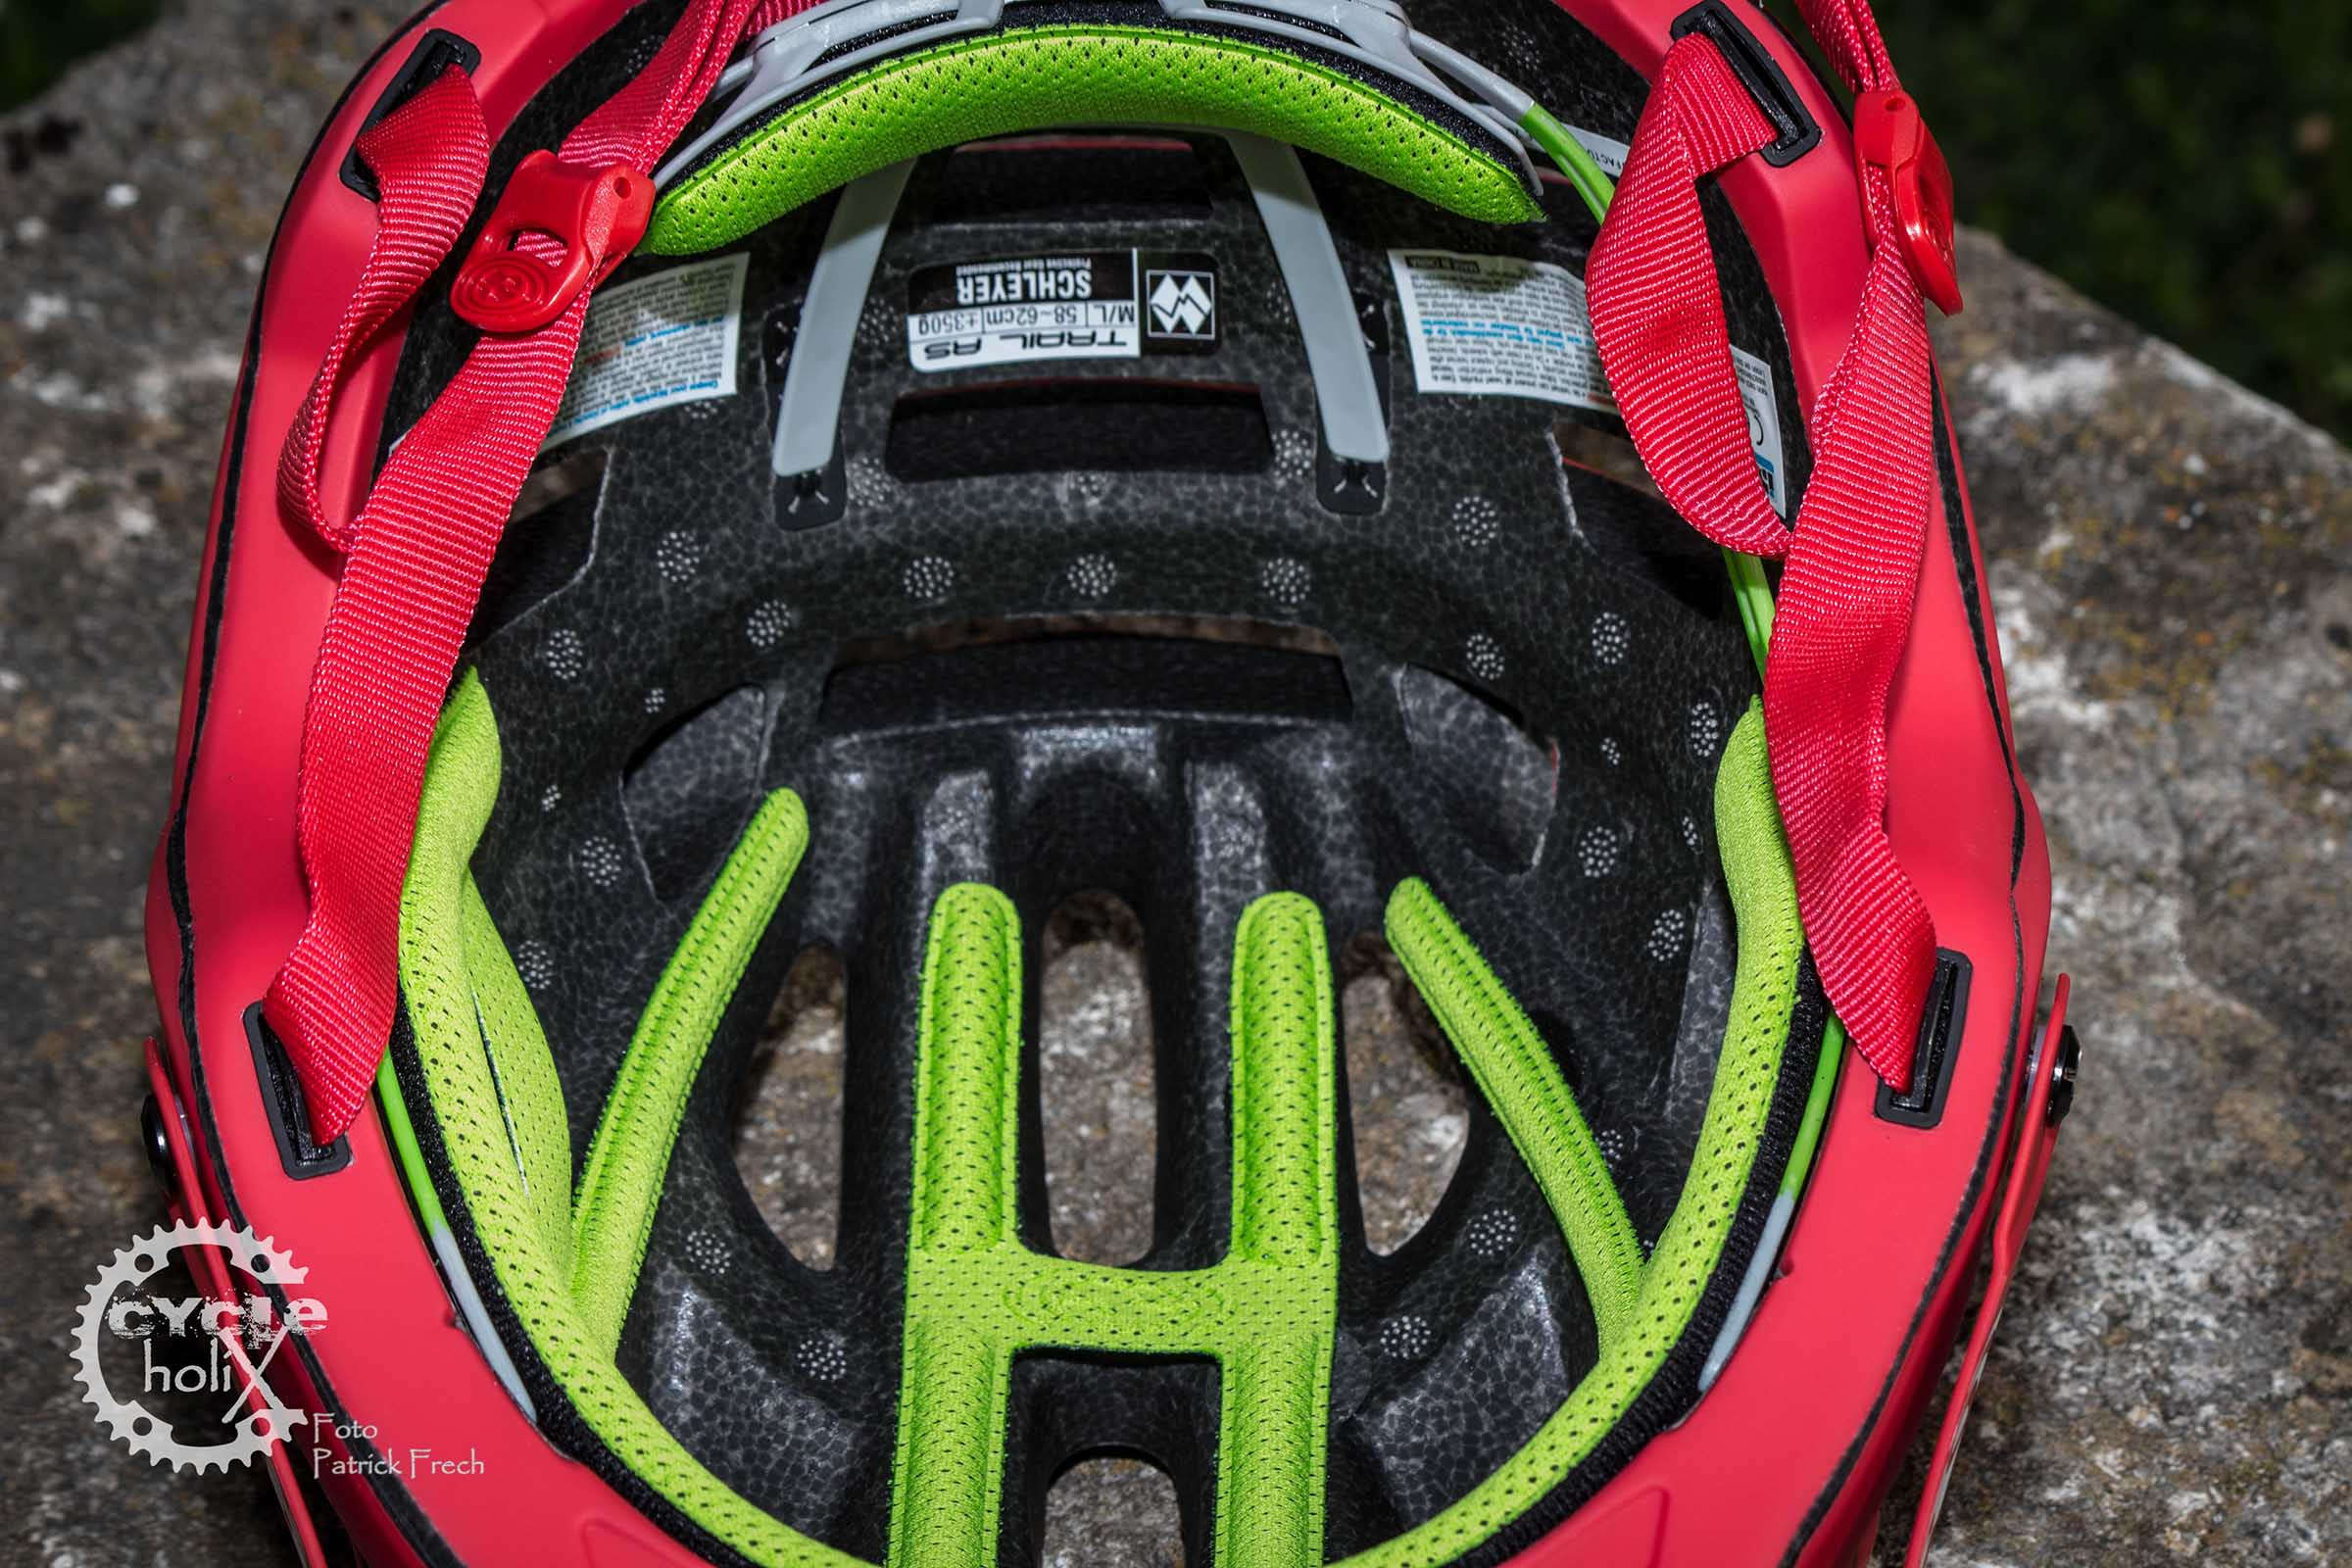 Ixs Trail Rs Evo Helmet Weight 2018 Review White Graphite Der Beste Mtb Helm 10 Modelle Im Outdoor Gear Sizing Expocafeperu Com